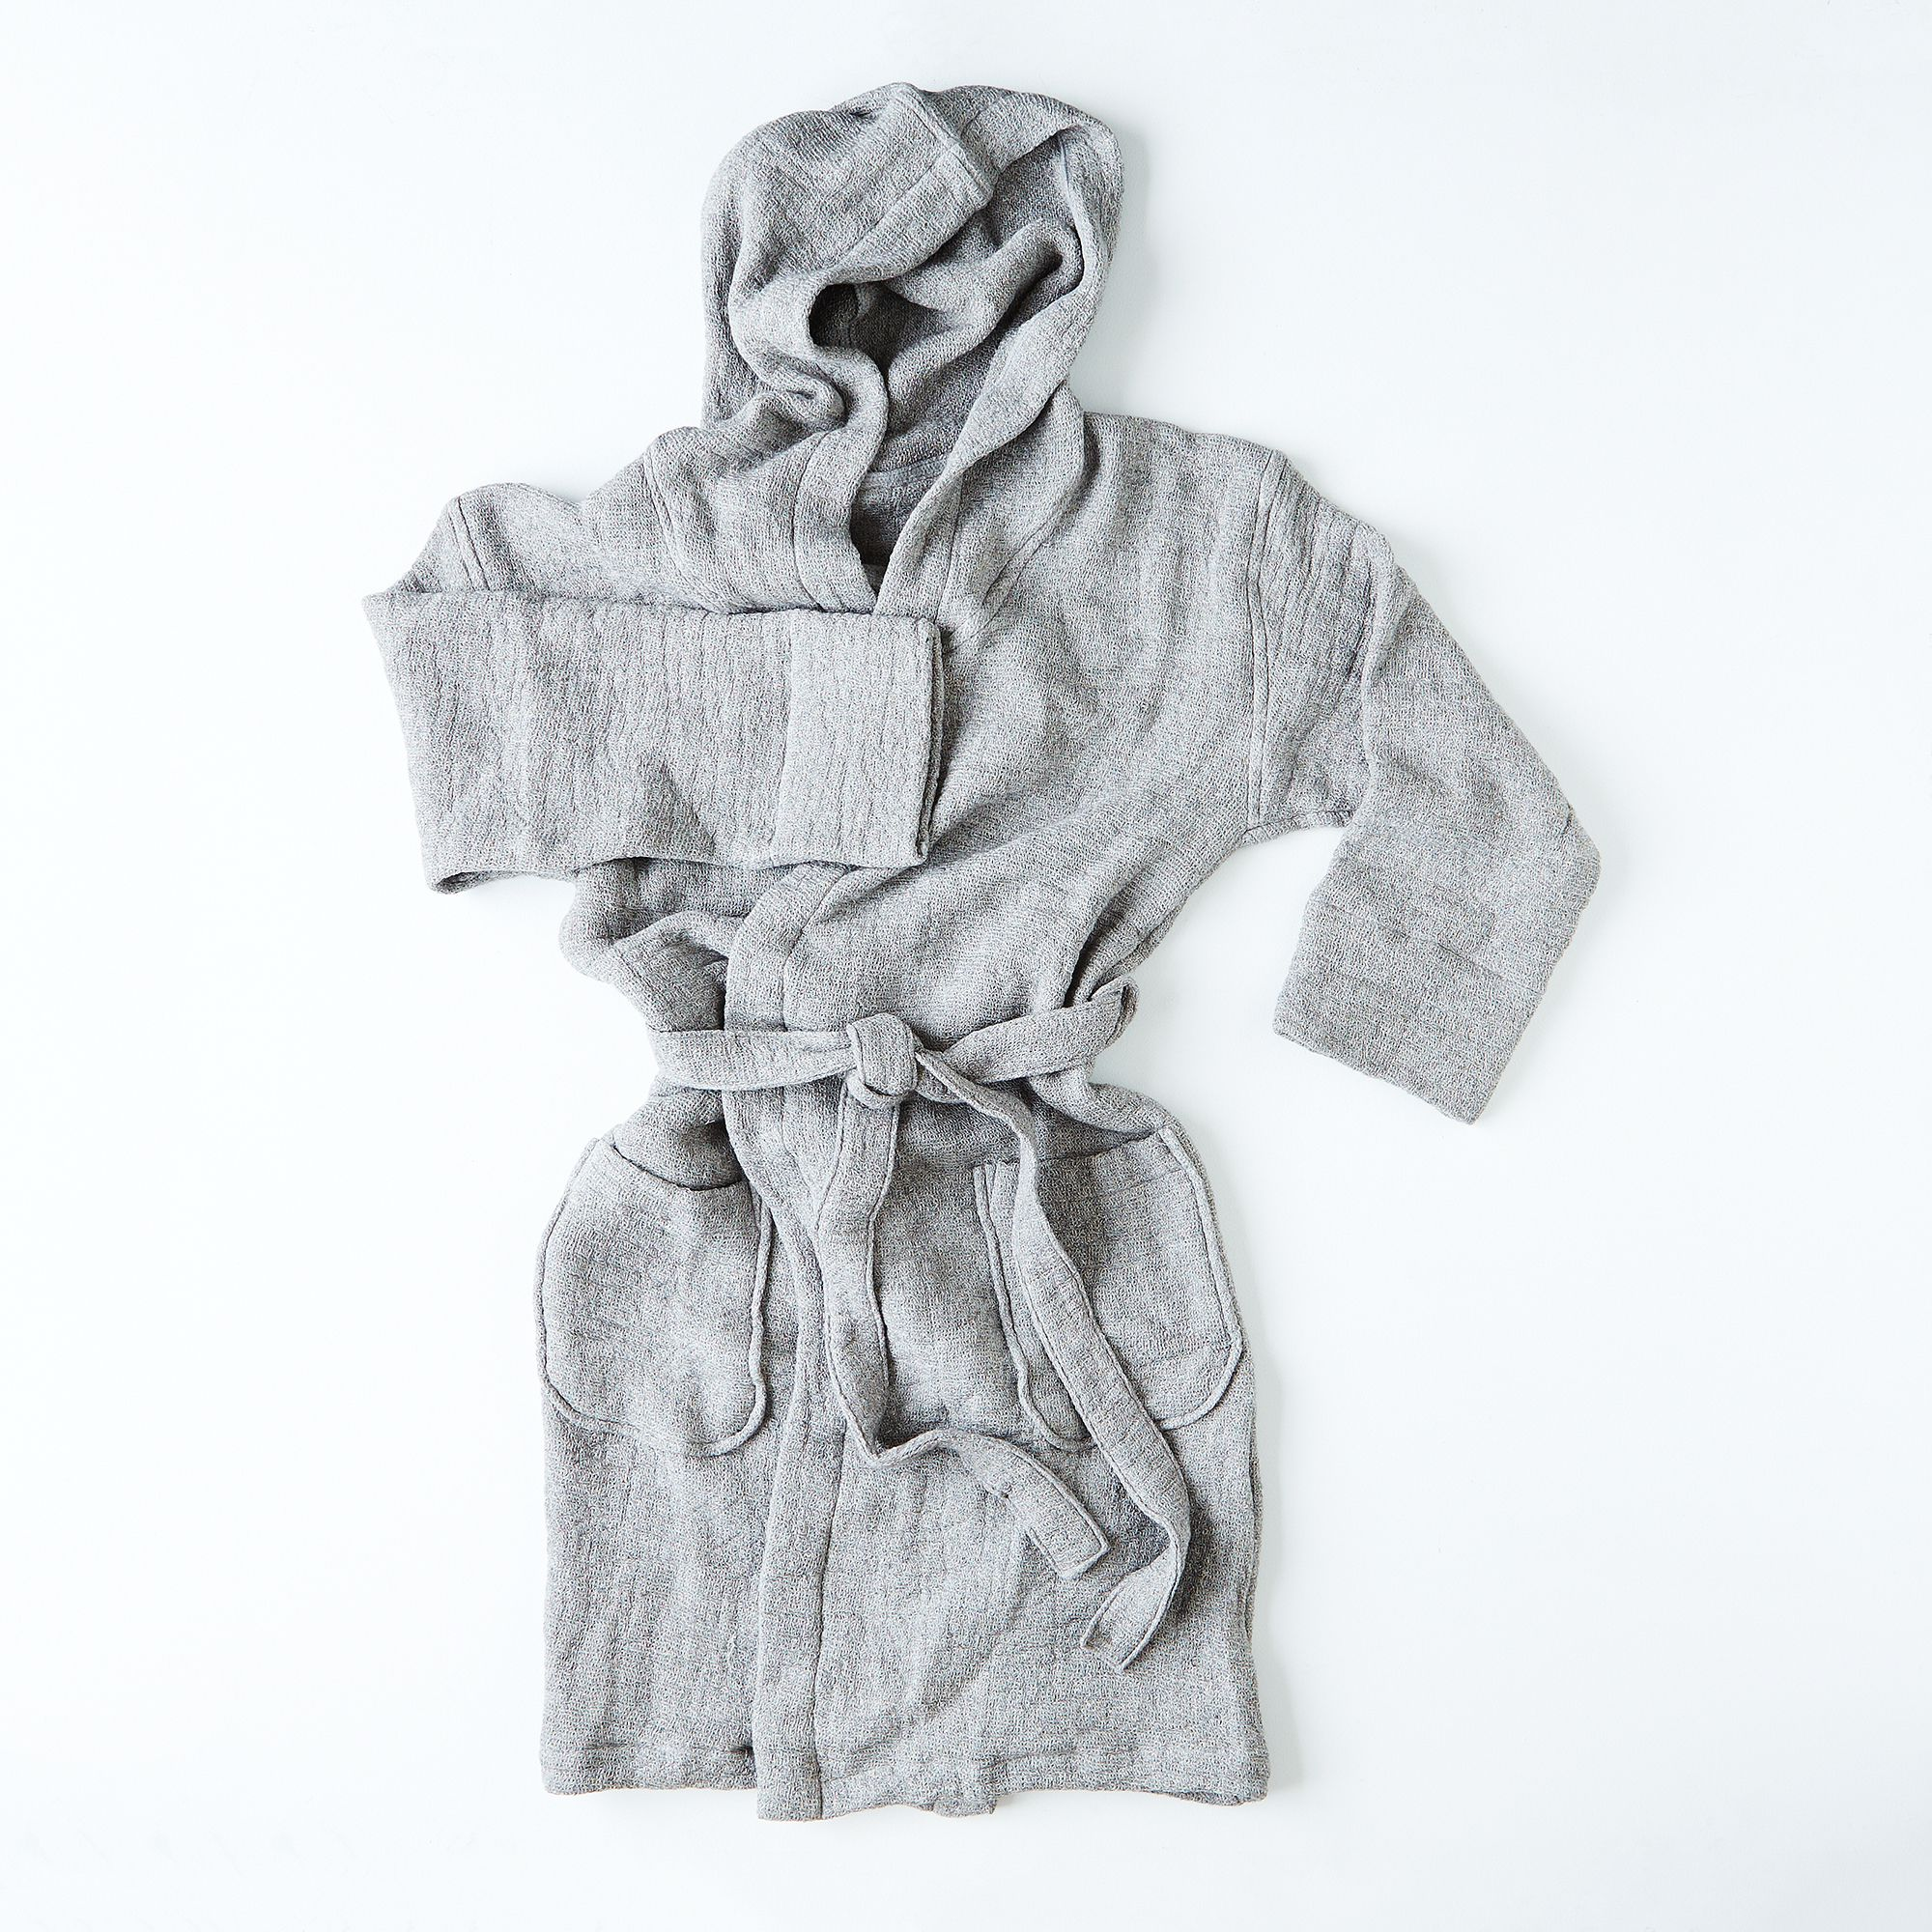 906539c4 acf3 487e bf81 ba98defabcbf  2015 0123 morihata lana extra soft cotton robe mw silo 013